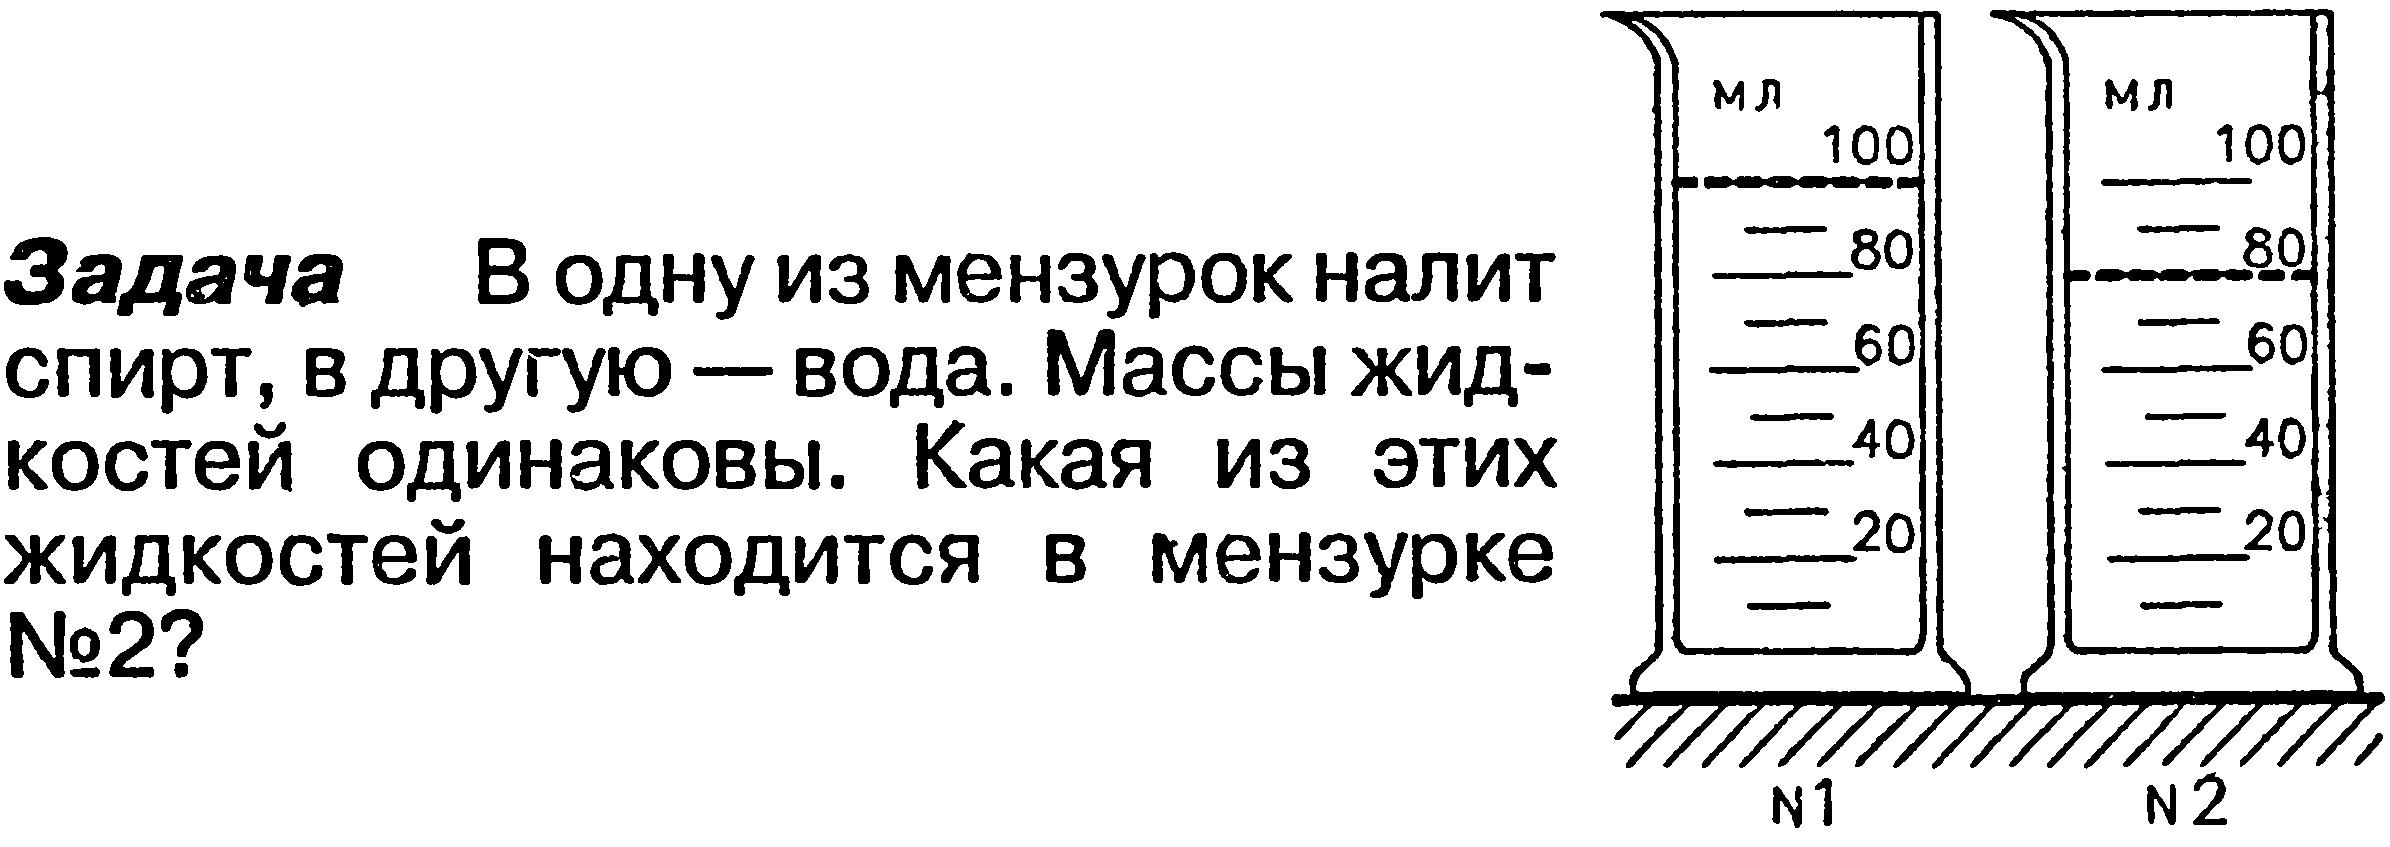 hello_html_5dfe8e33.png